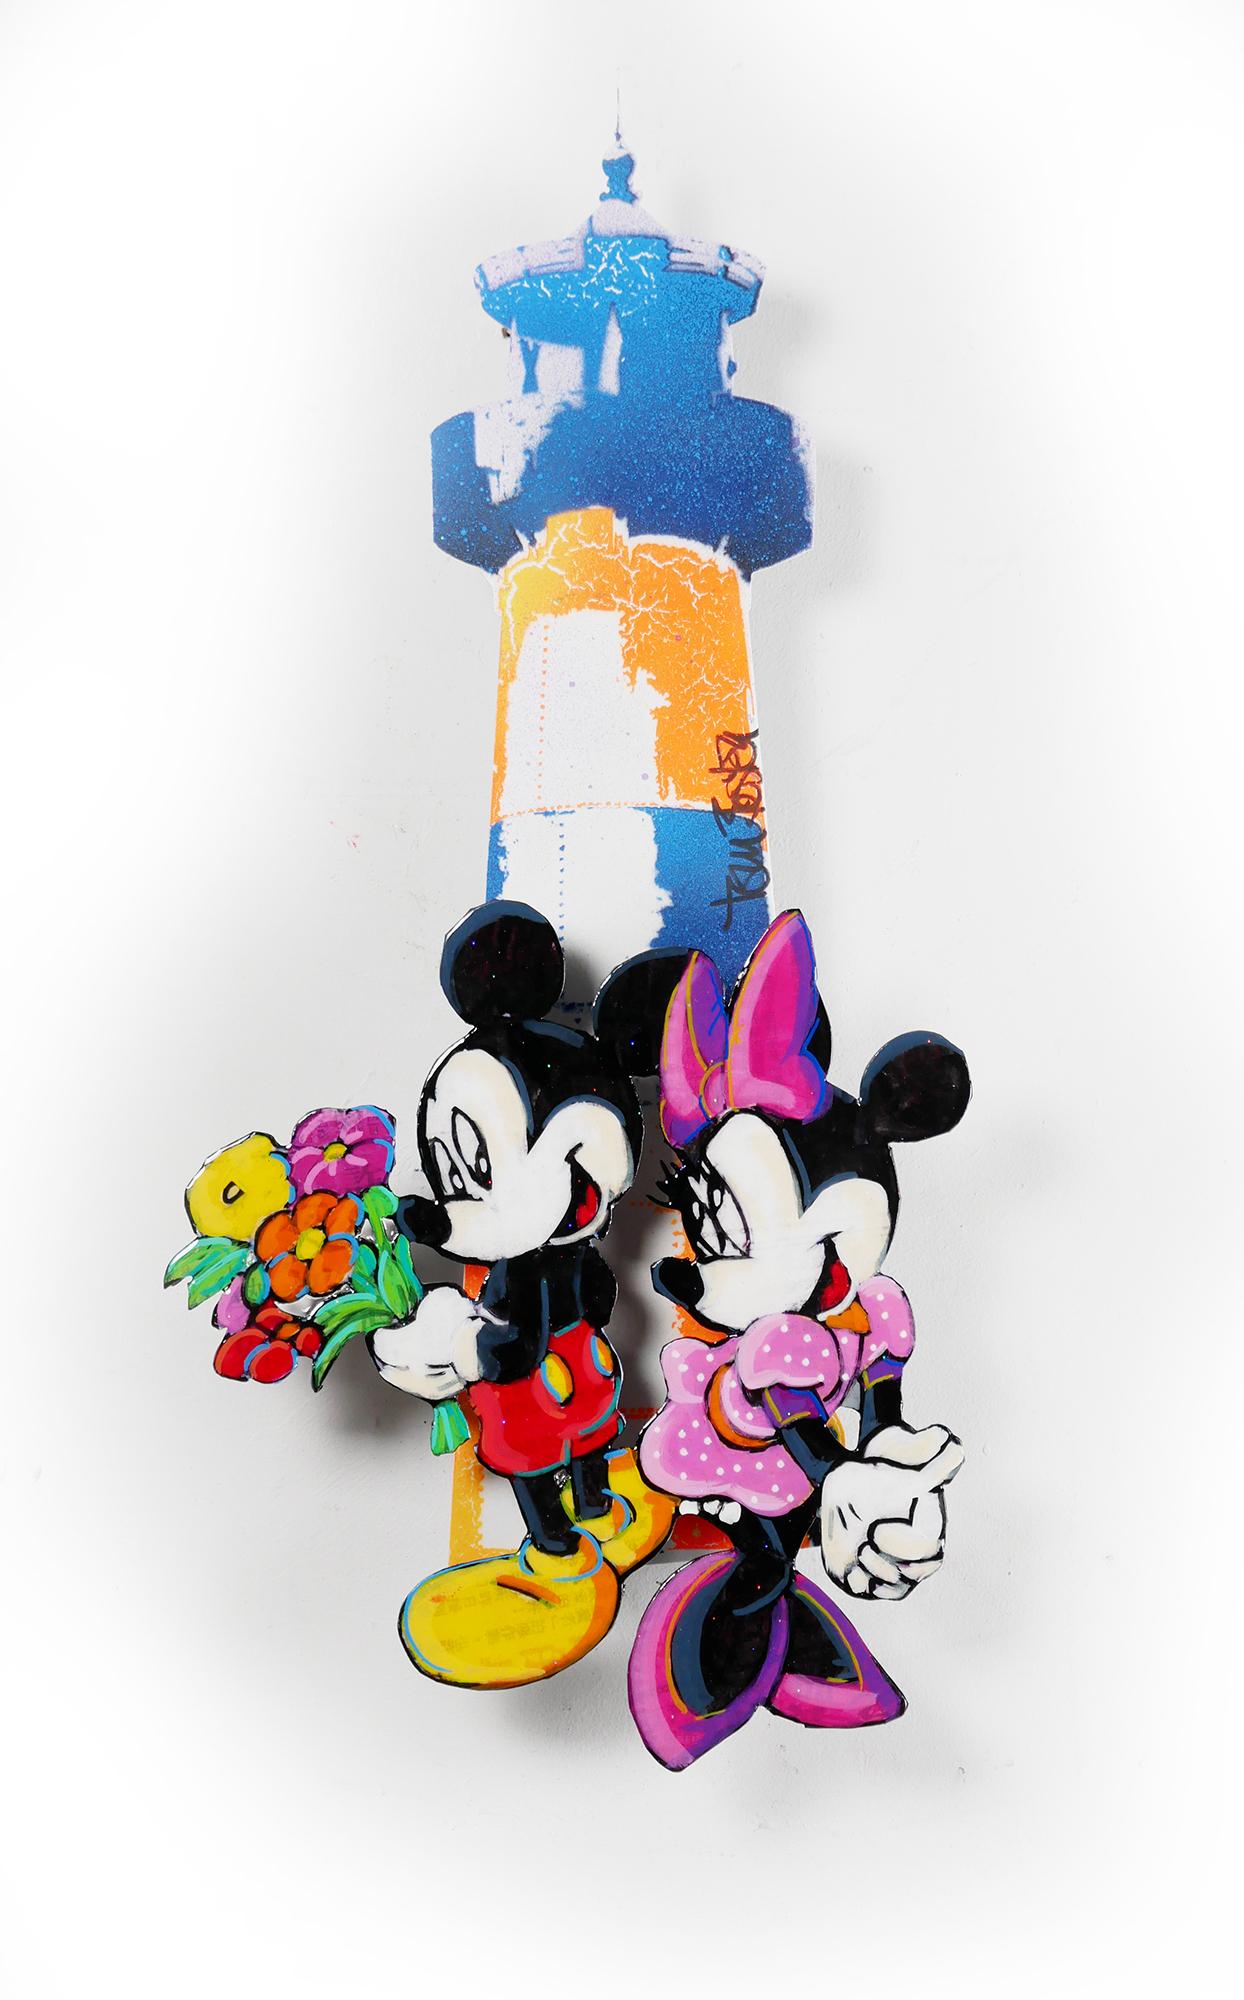 Tom Boston - My Light (Mickey & Minnie) , 8022-006-064